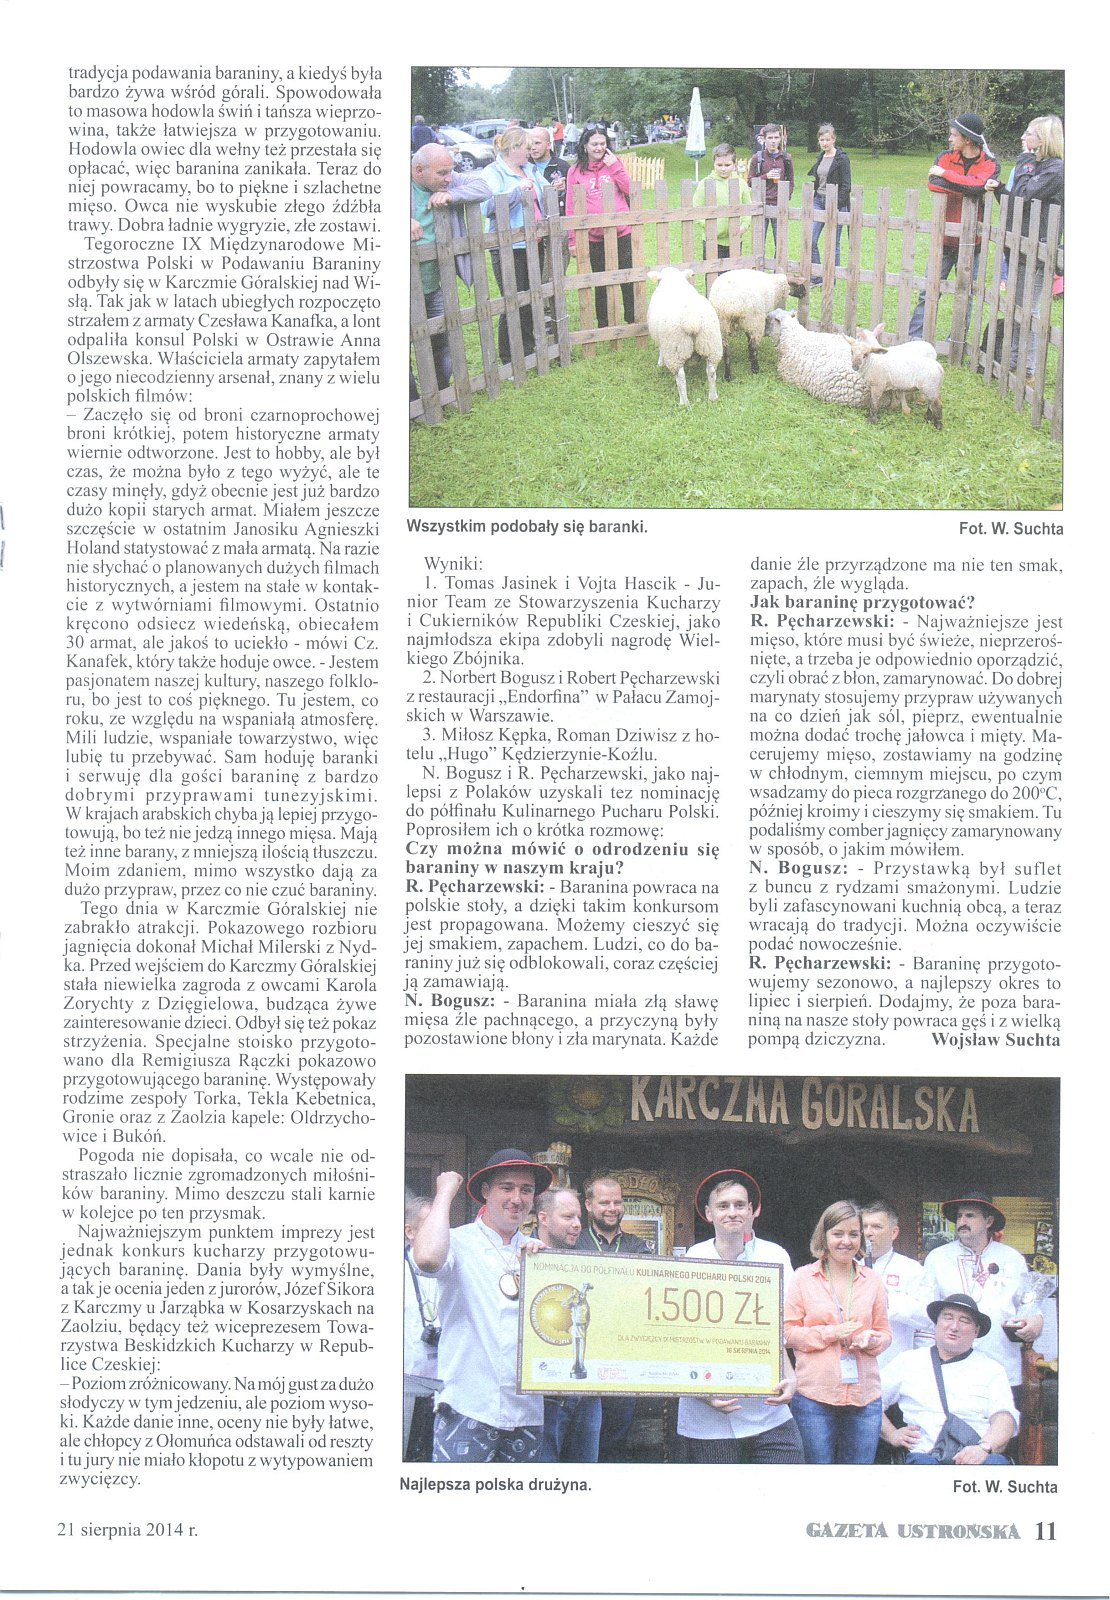 Gazeta Ustrońska